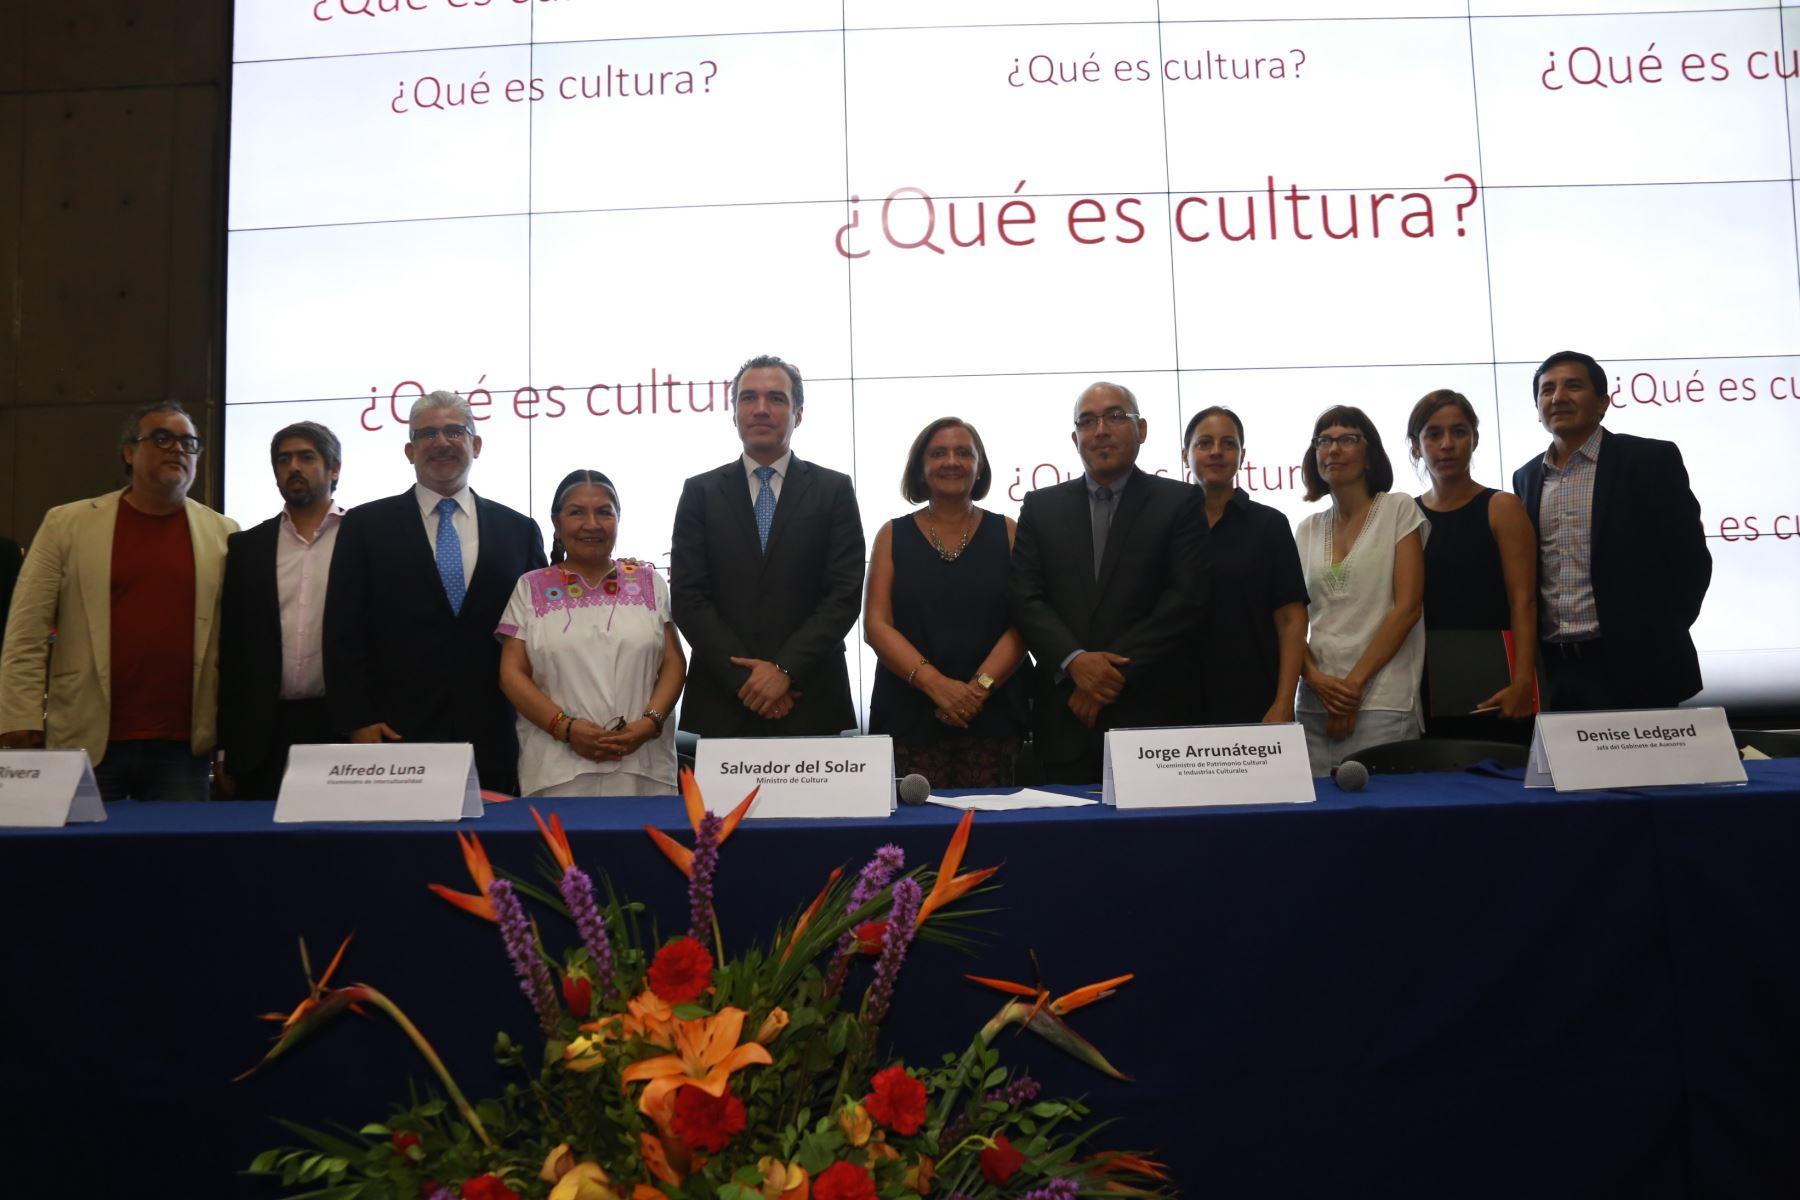 Comisión Consultiva para elaboración de Política Nacional de Cultura Foto: Ministerio de Cultura.